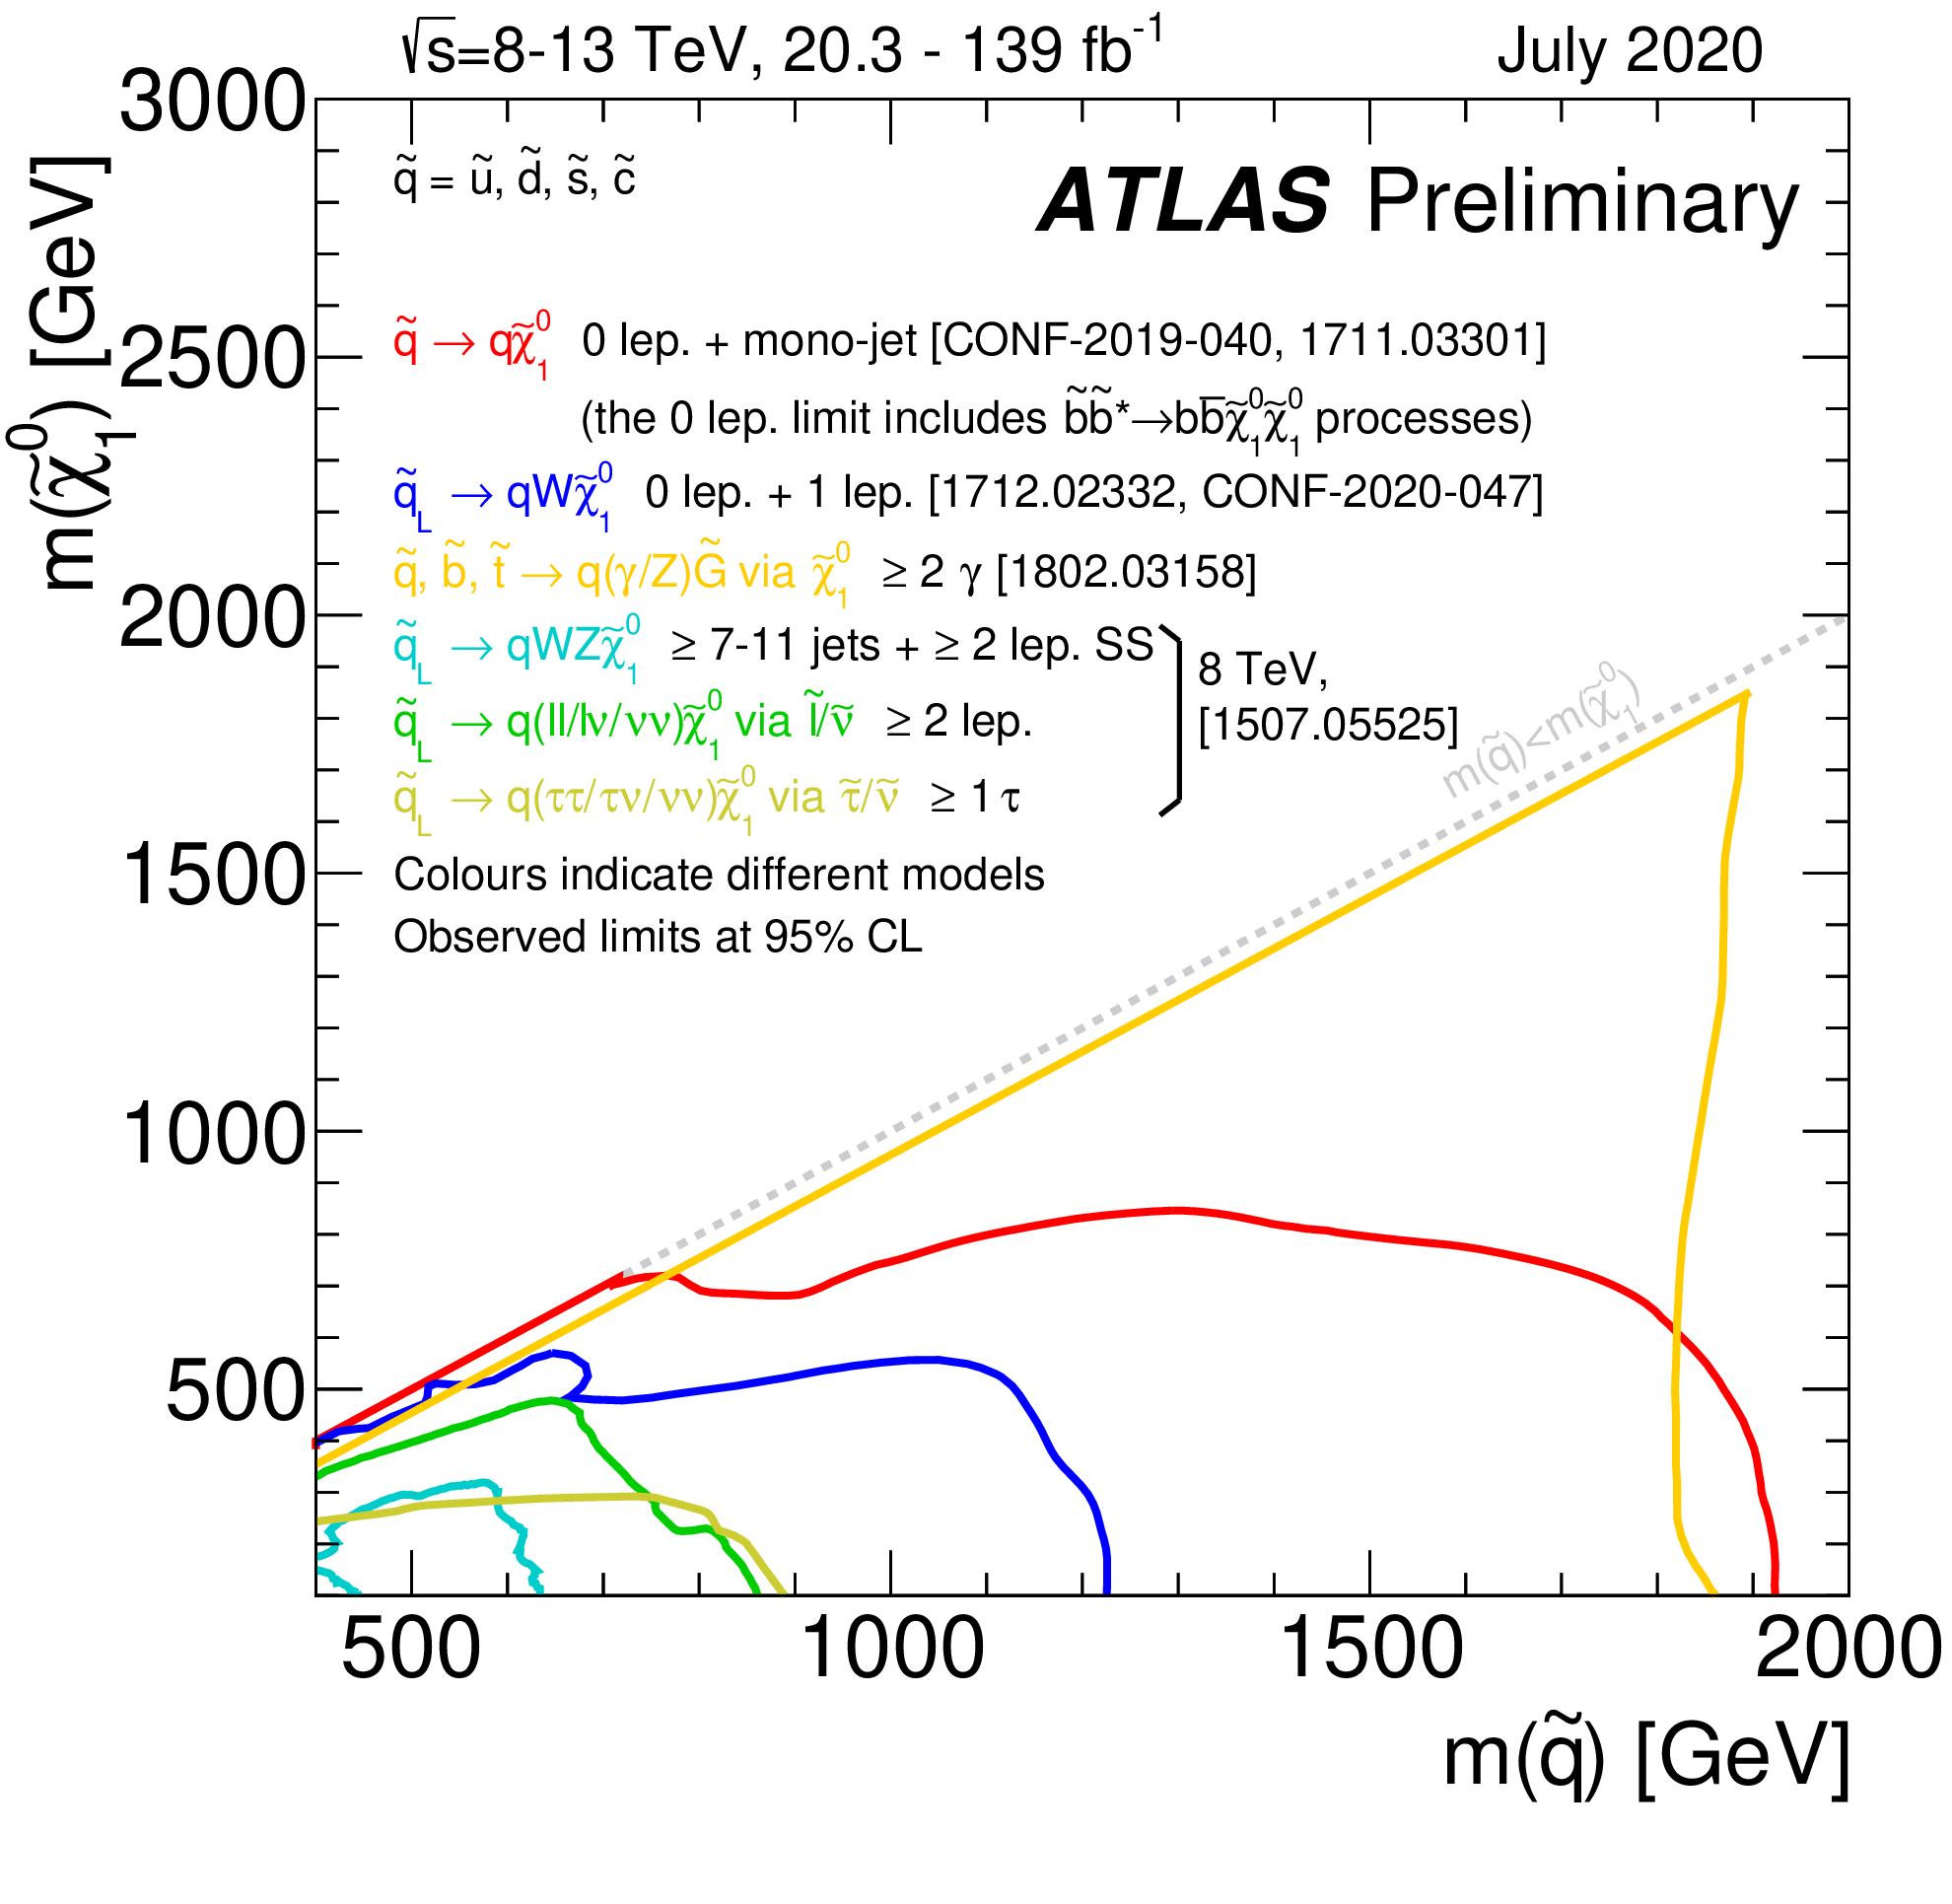 https://atlas.web.cern.ch/Atlas/GROUPS/PHYSICS/CombinedSummaryPlots/SUSY/ATLAS_SUSY_Strong_squark/ATLAS_SUSY_Strong_squark.png